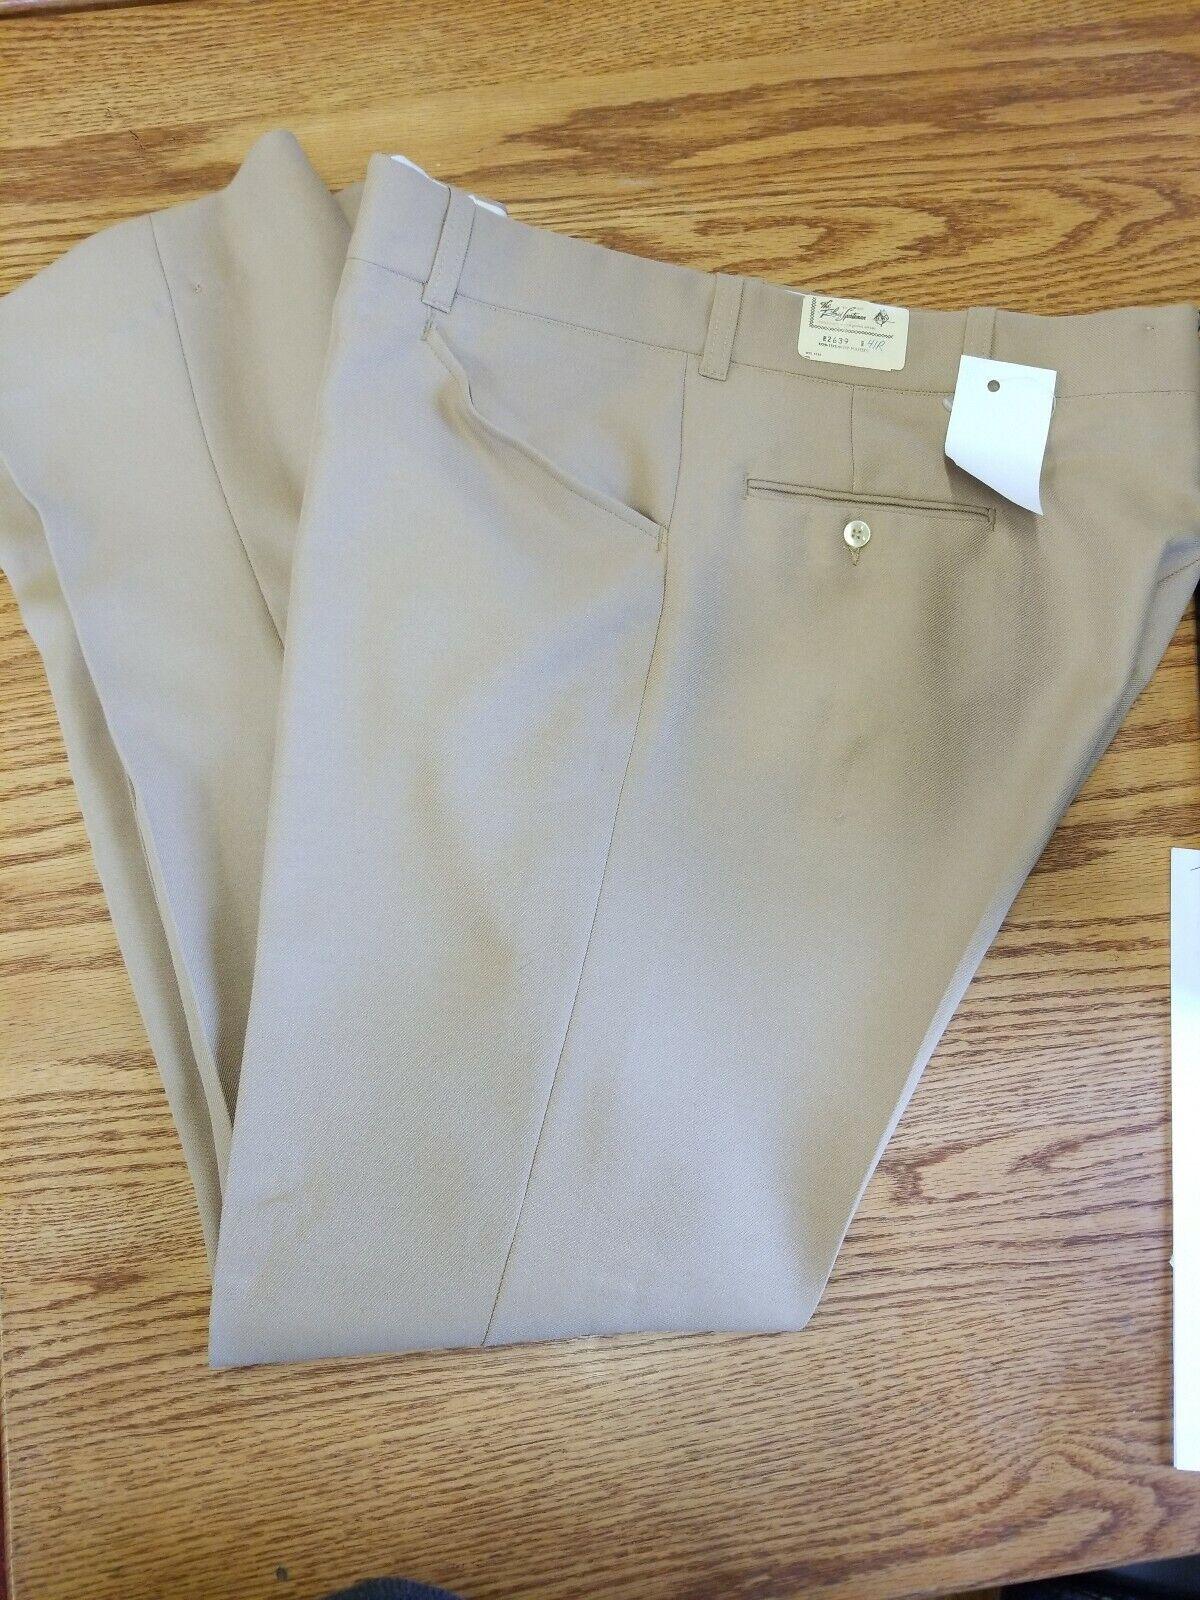 41 R pantalones de Lord Jeffrey jodlifer